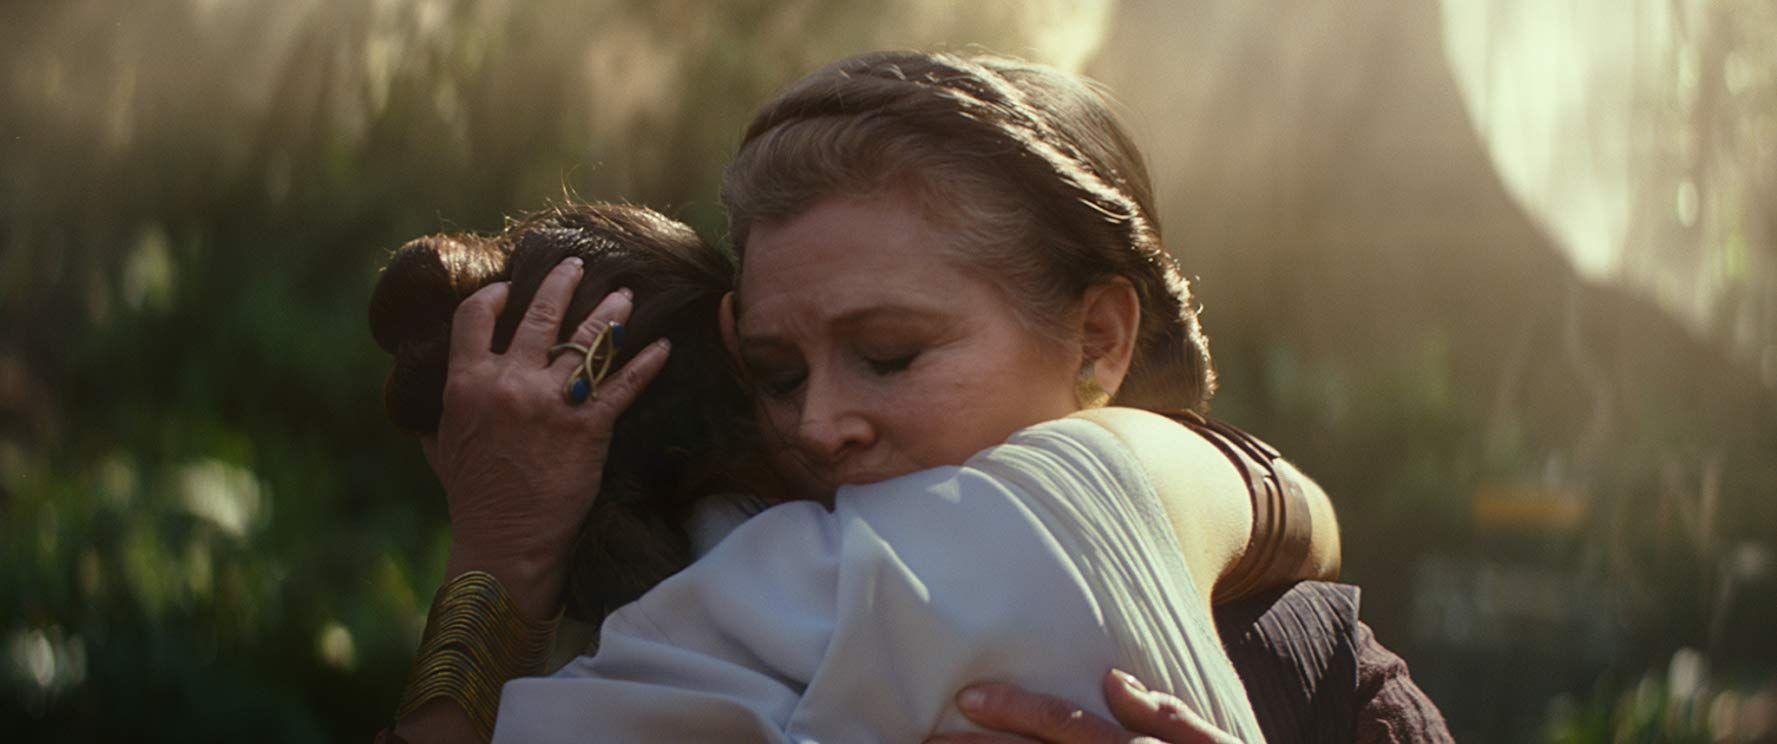 Imagen 4 de Star Wars: El Ascenso de Skywalker